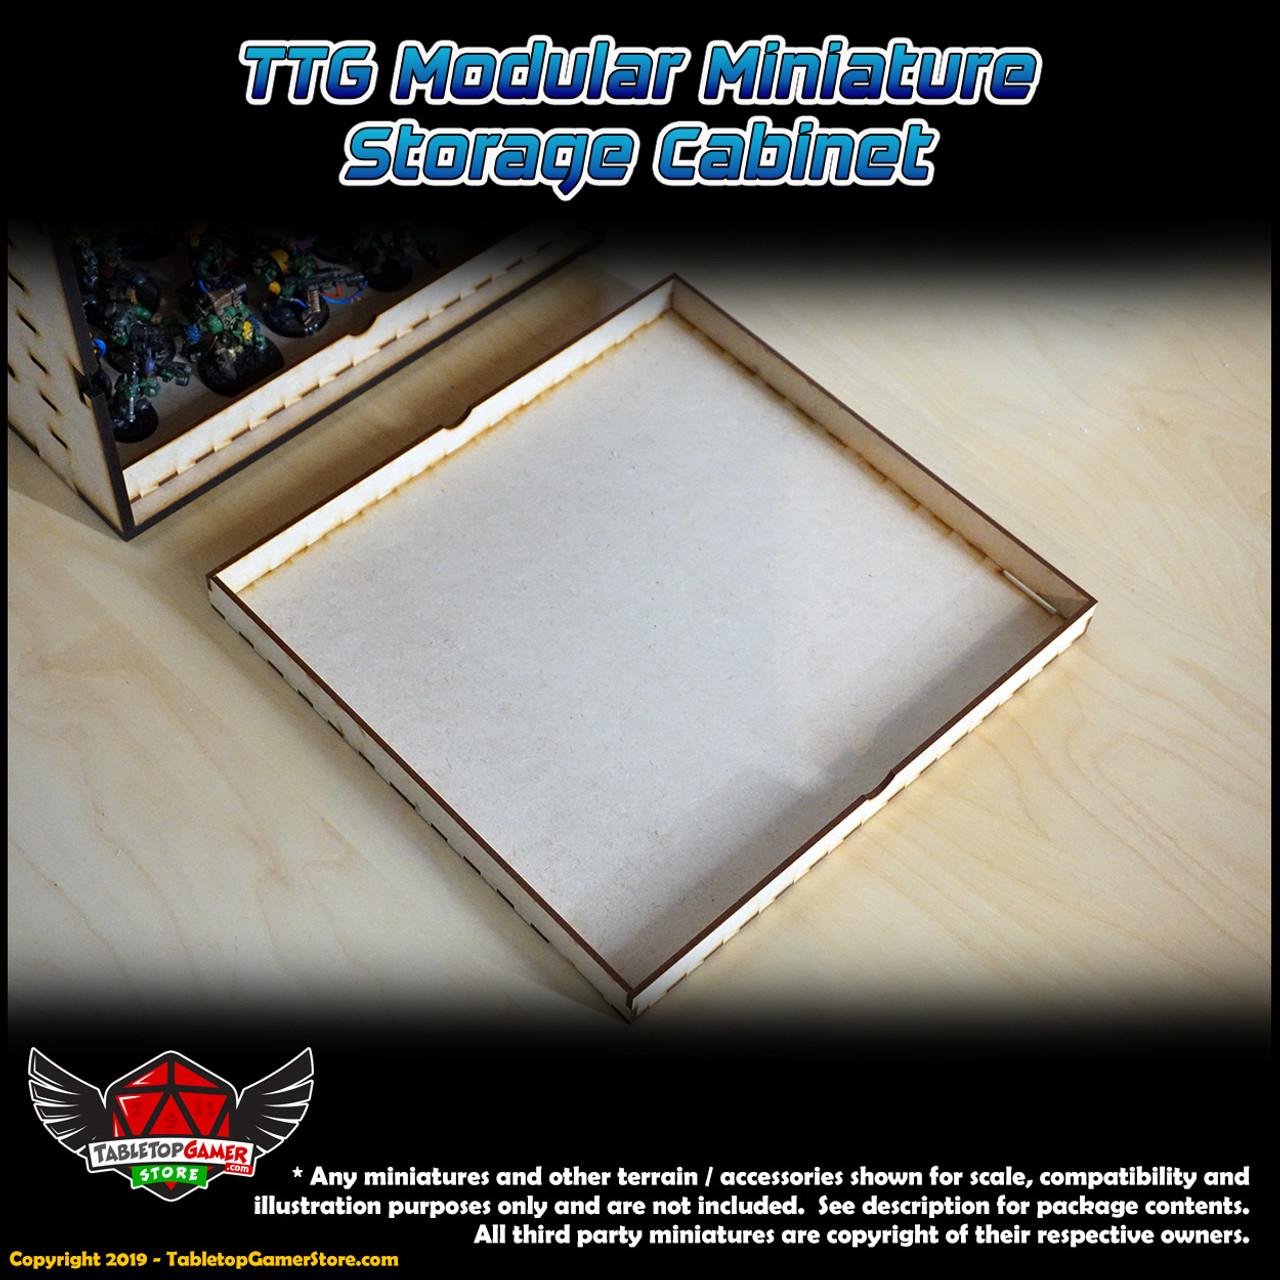 TTG Modular Miniature Storage Cabinet